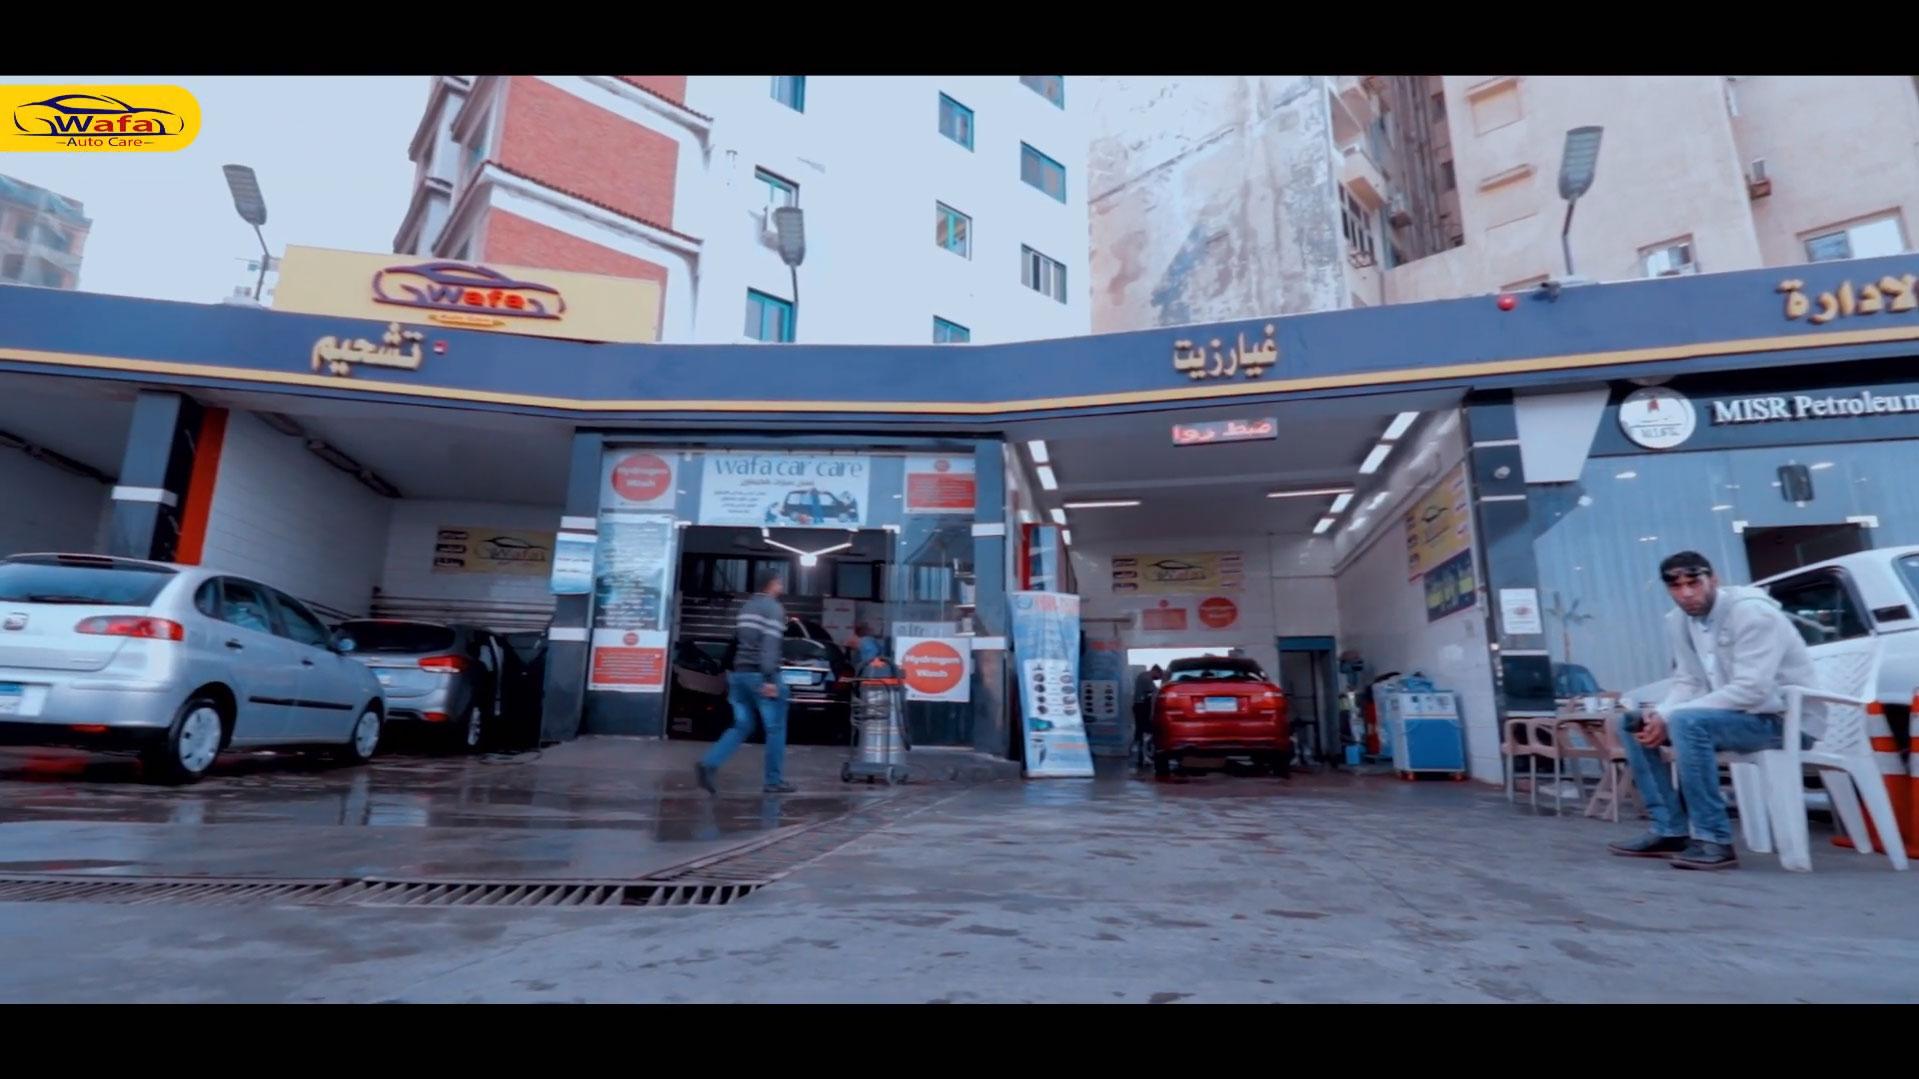 Wafa Auto Care2 - إنتاج الفيديوهات -